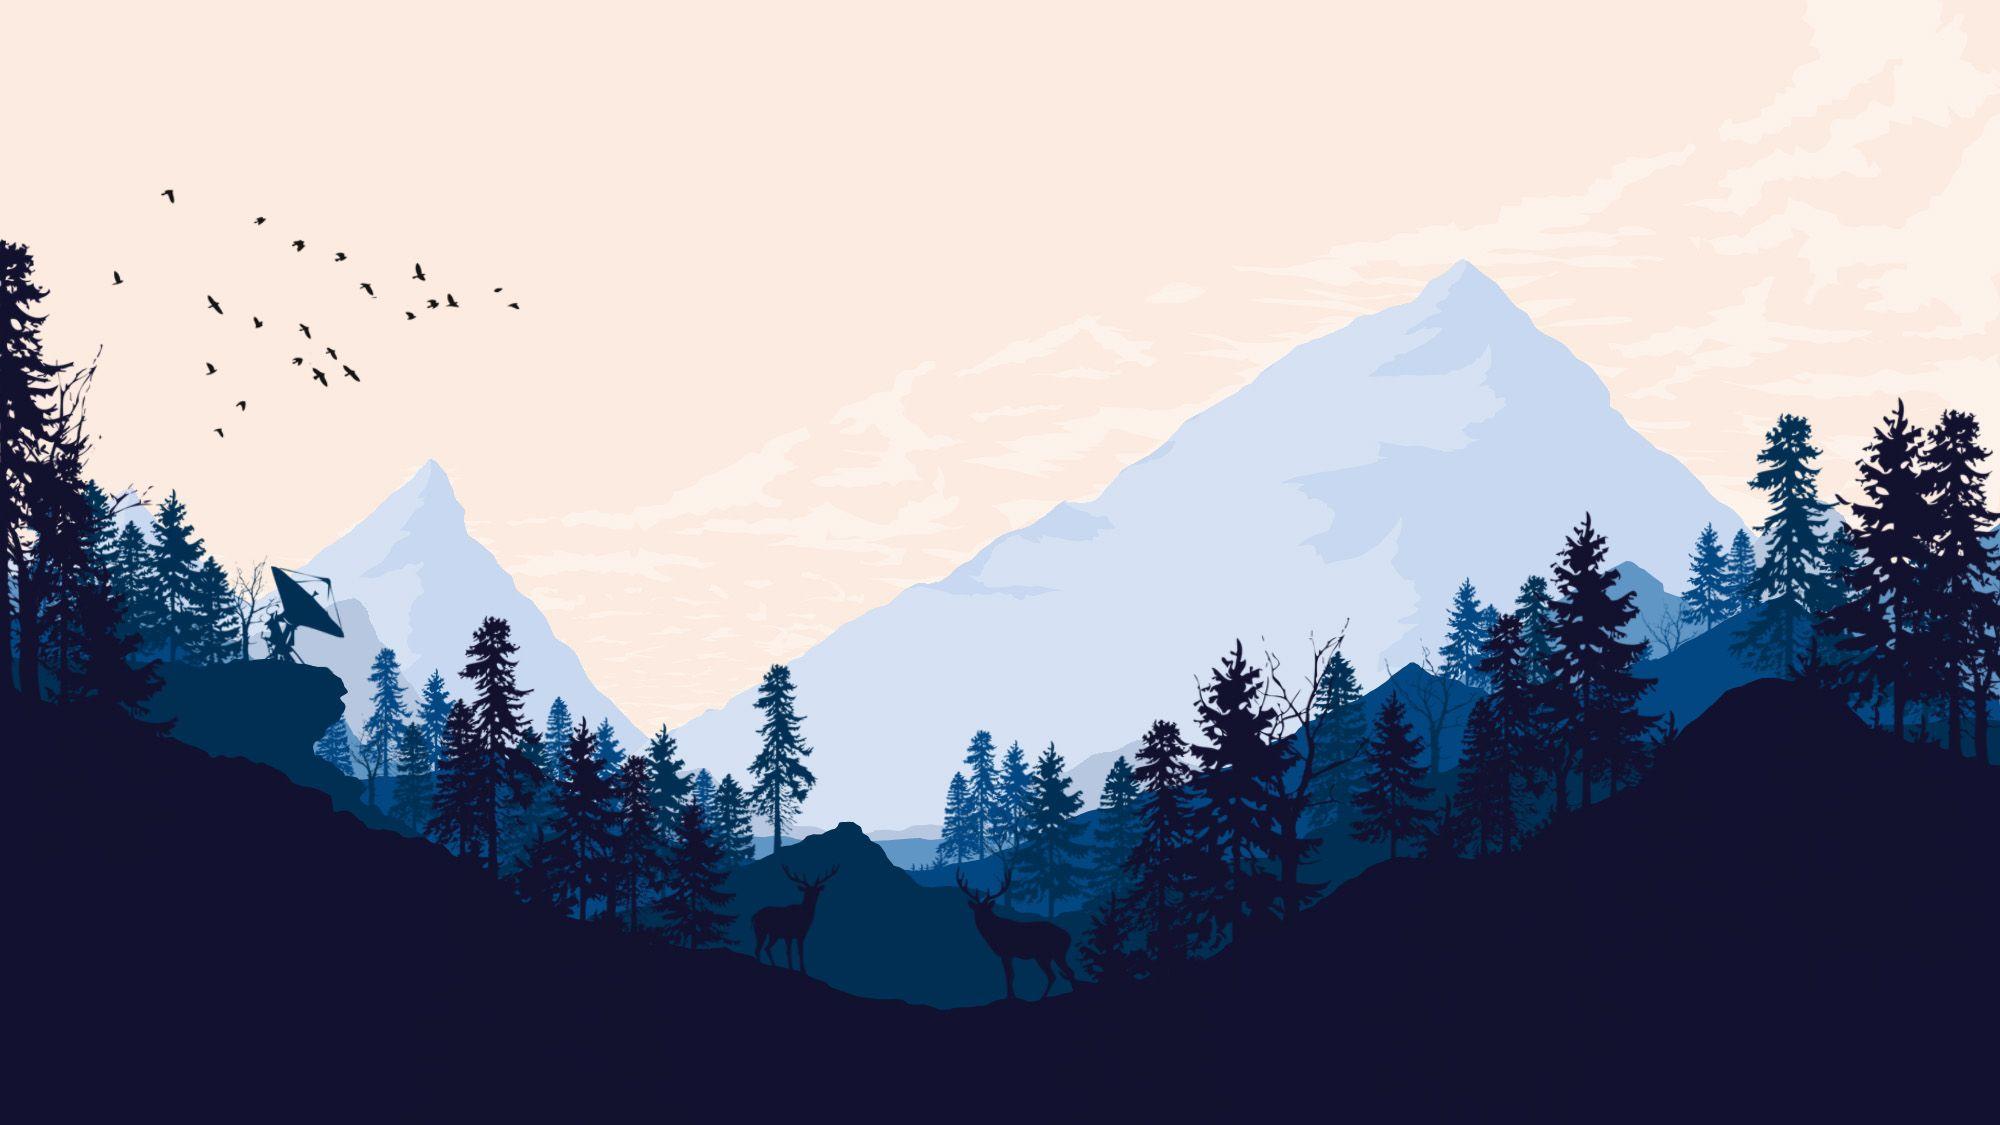 Played Firewatch got inspired. Landscape wallpaper